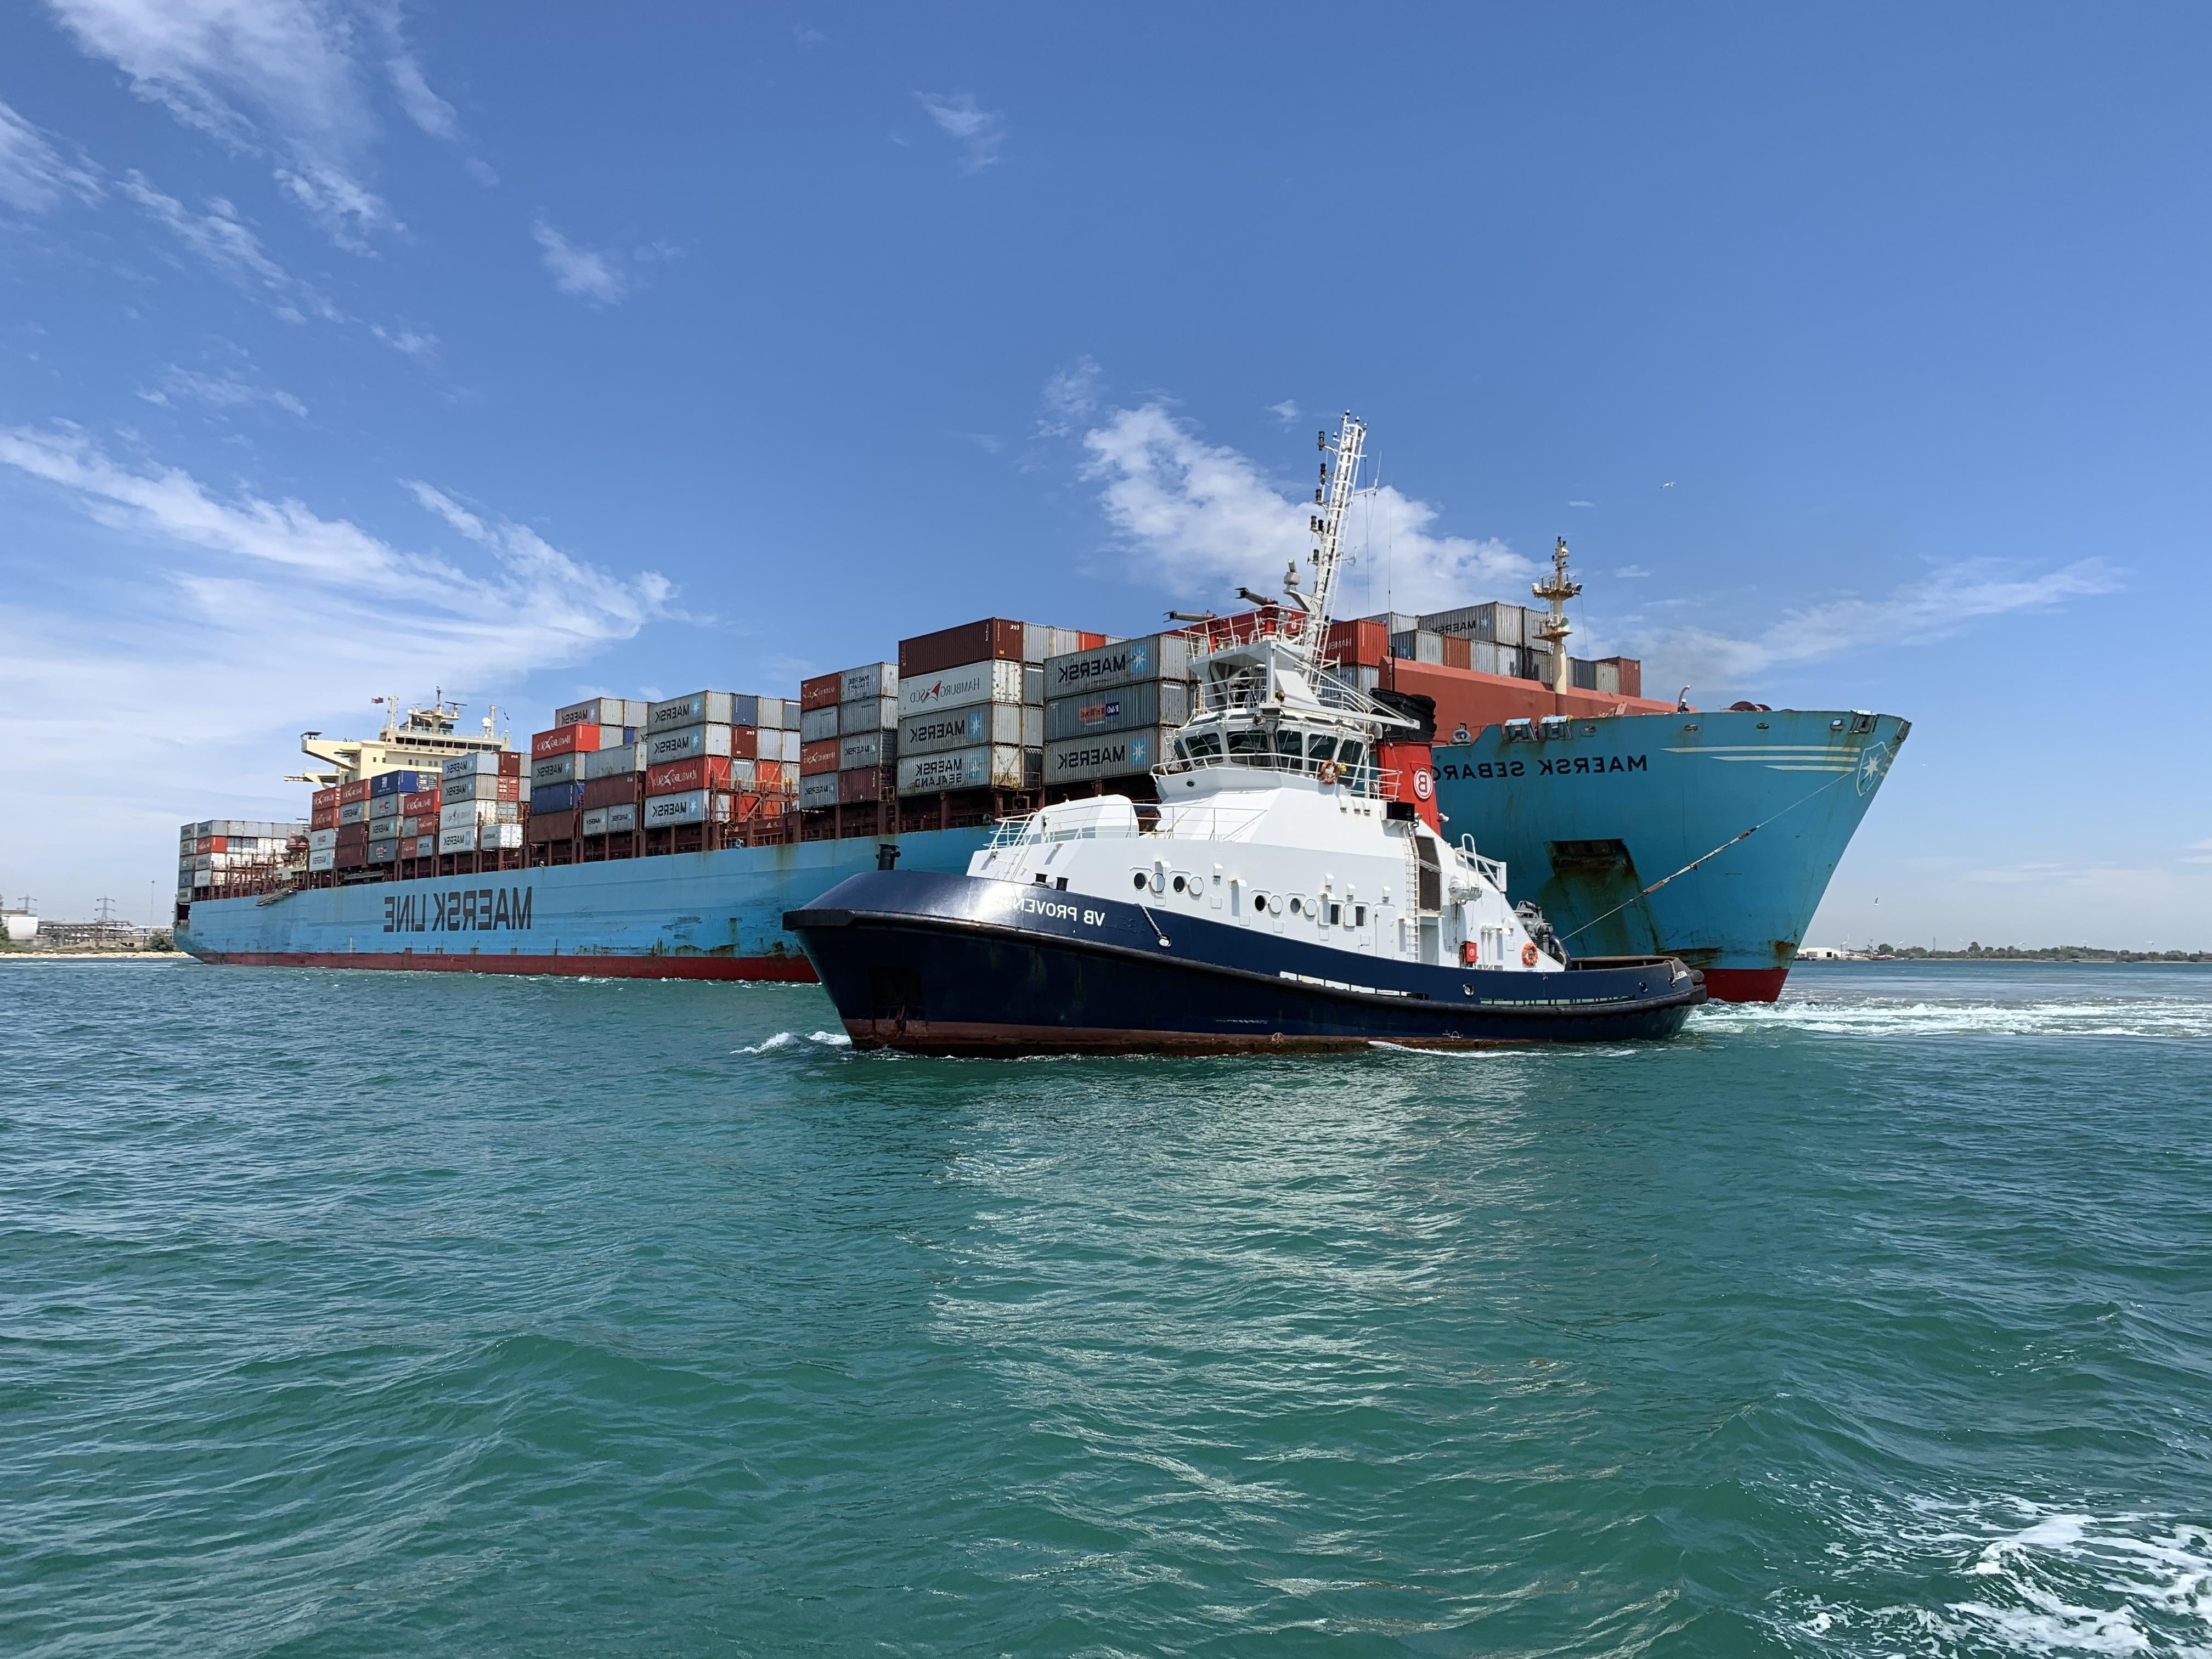 Marseille Fos VB Provence Maersk SEBAROK juin 2019 crédits Denis Monserand